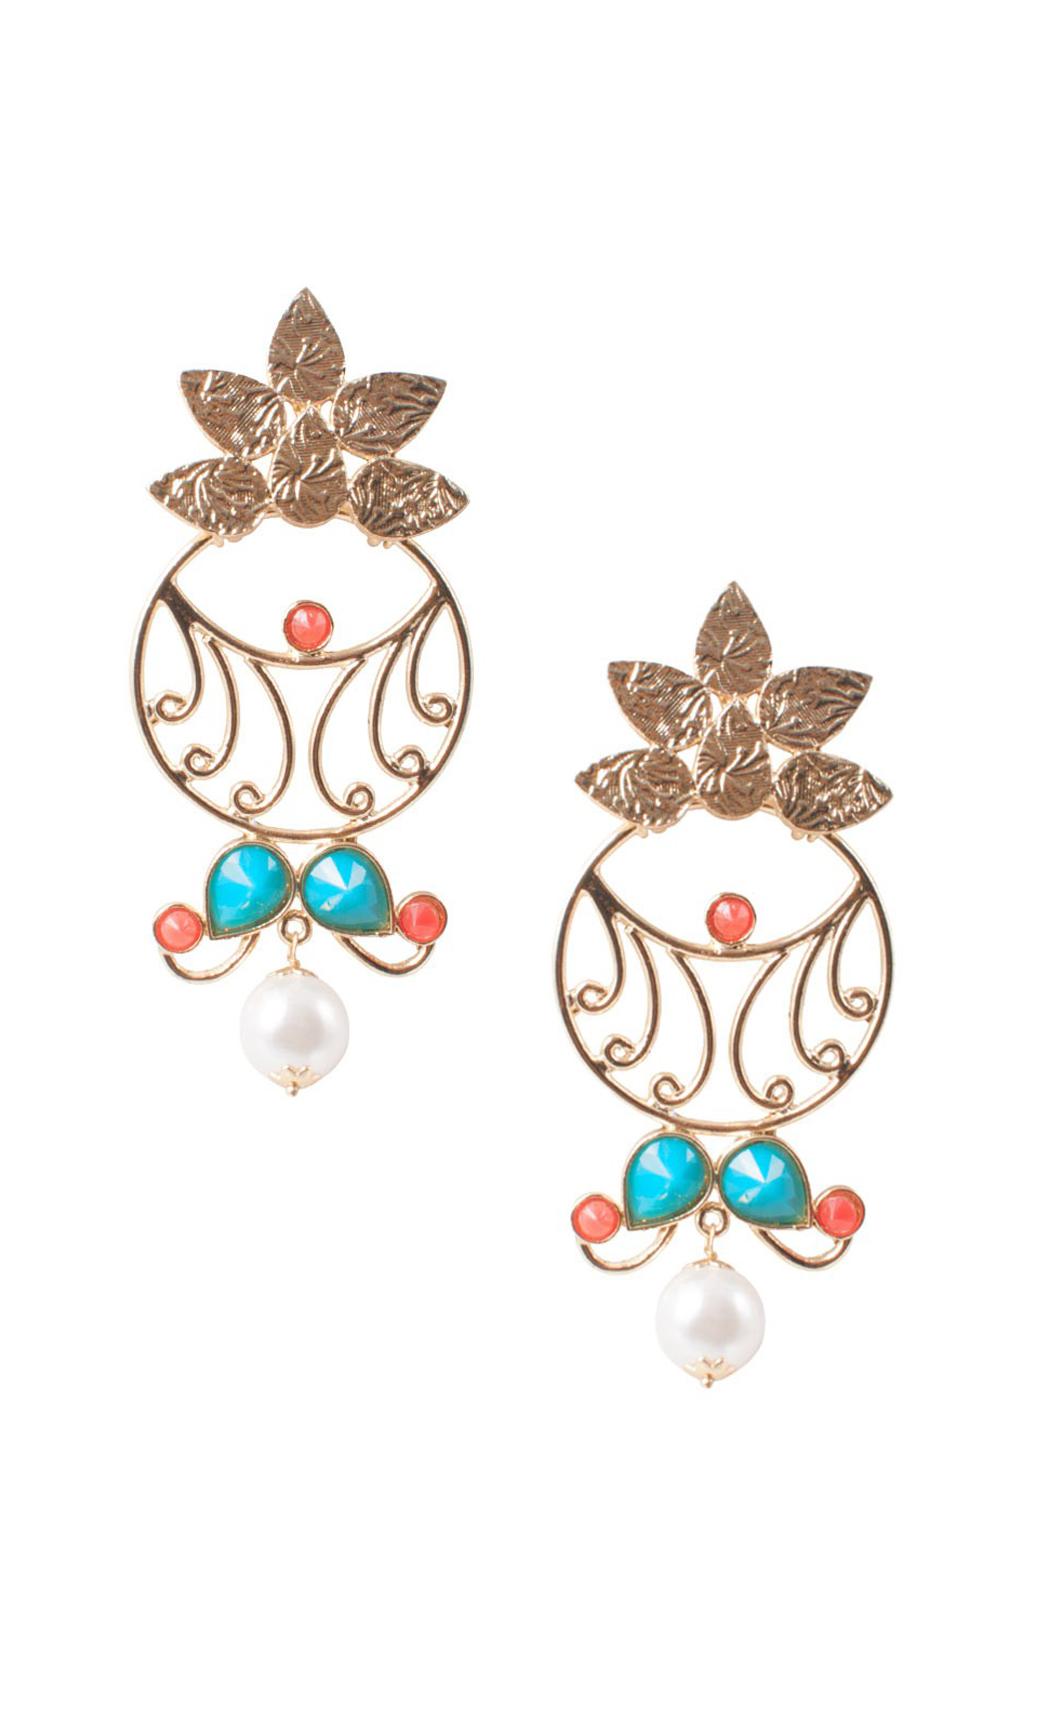 Tangerine Floret Earrings - Shop Online